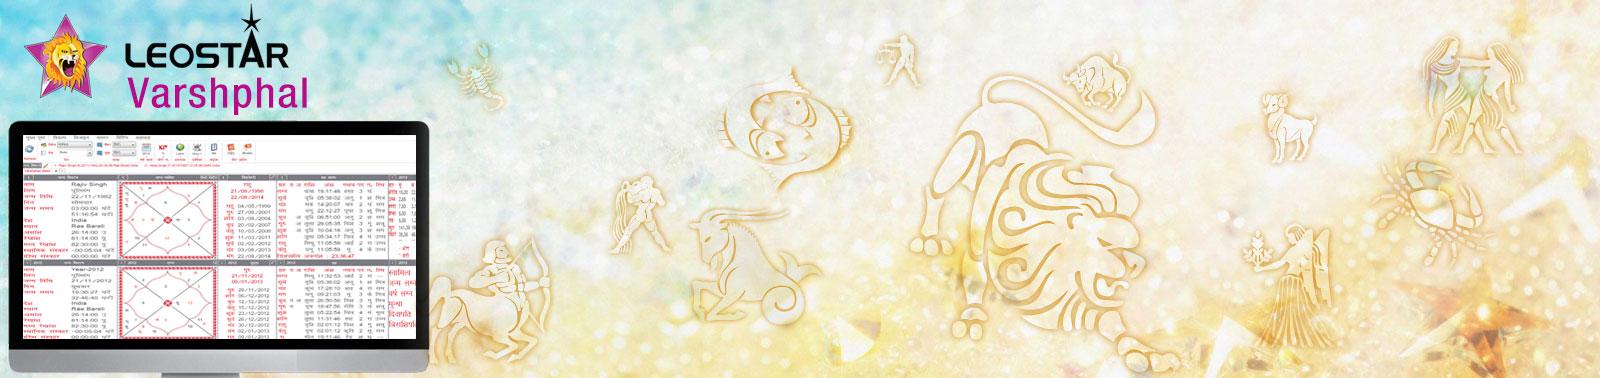 Leostar Varshphal is best software in field of astrology